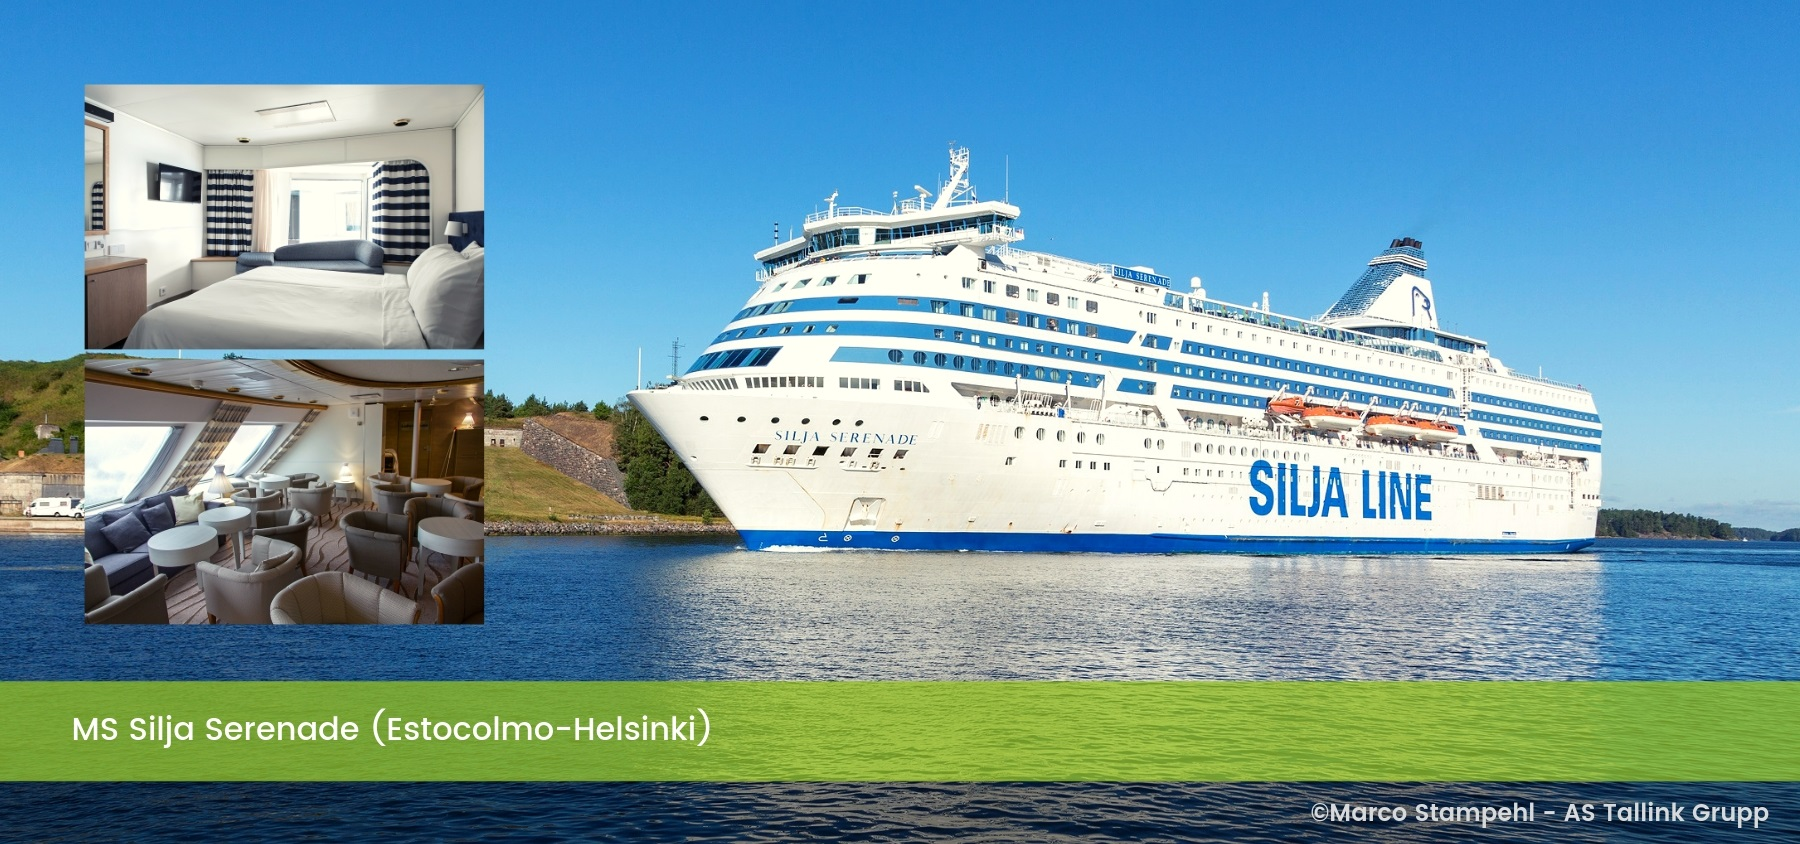 Ms Silja Serenade (Estocolmo-Helsinki)